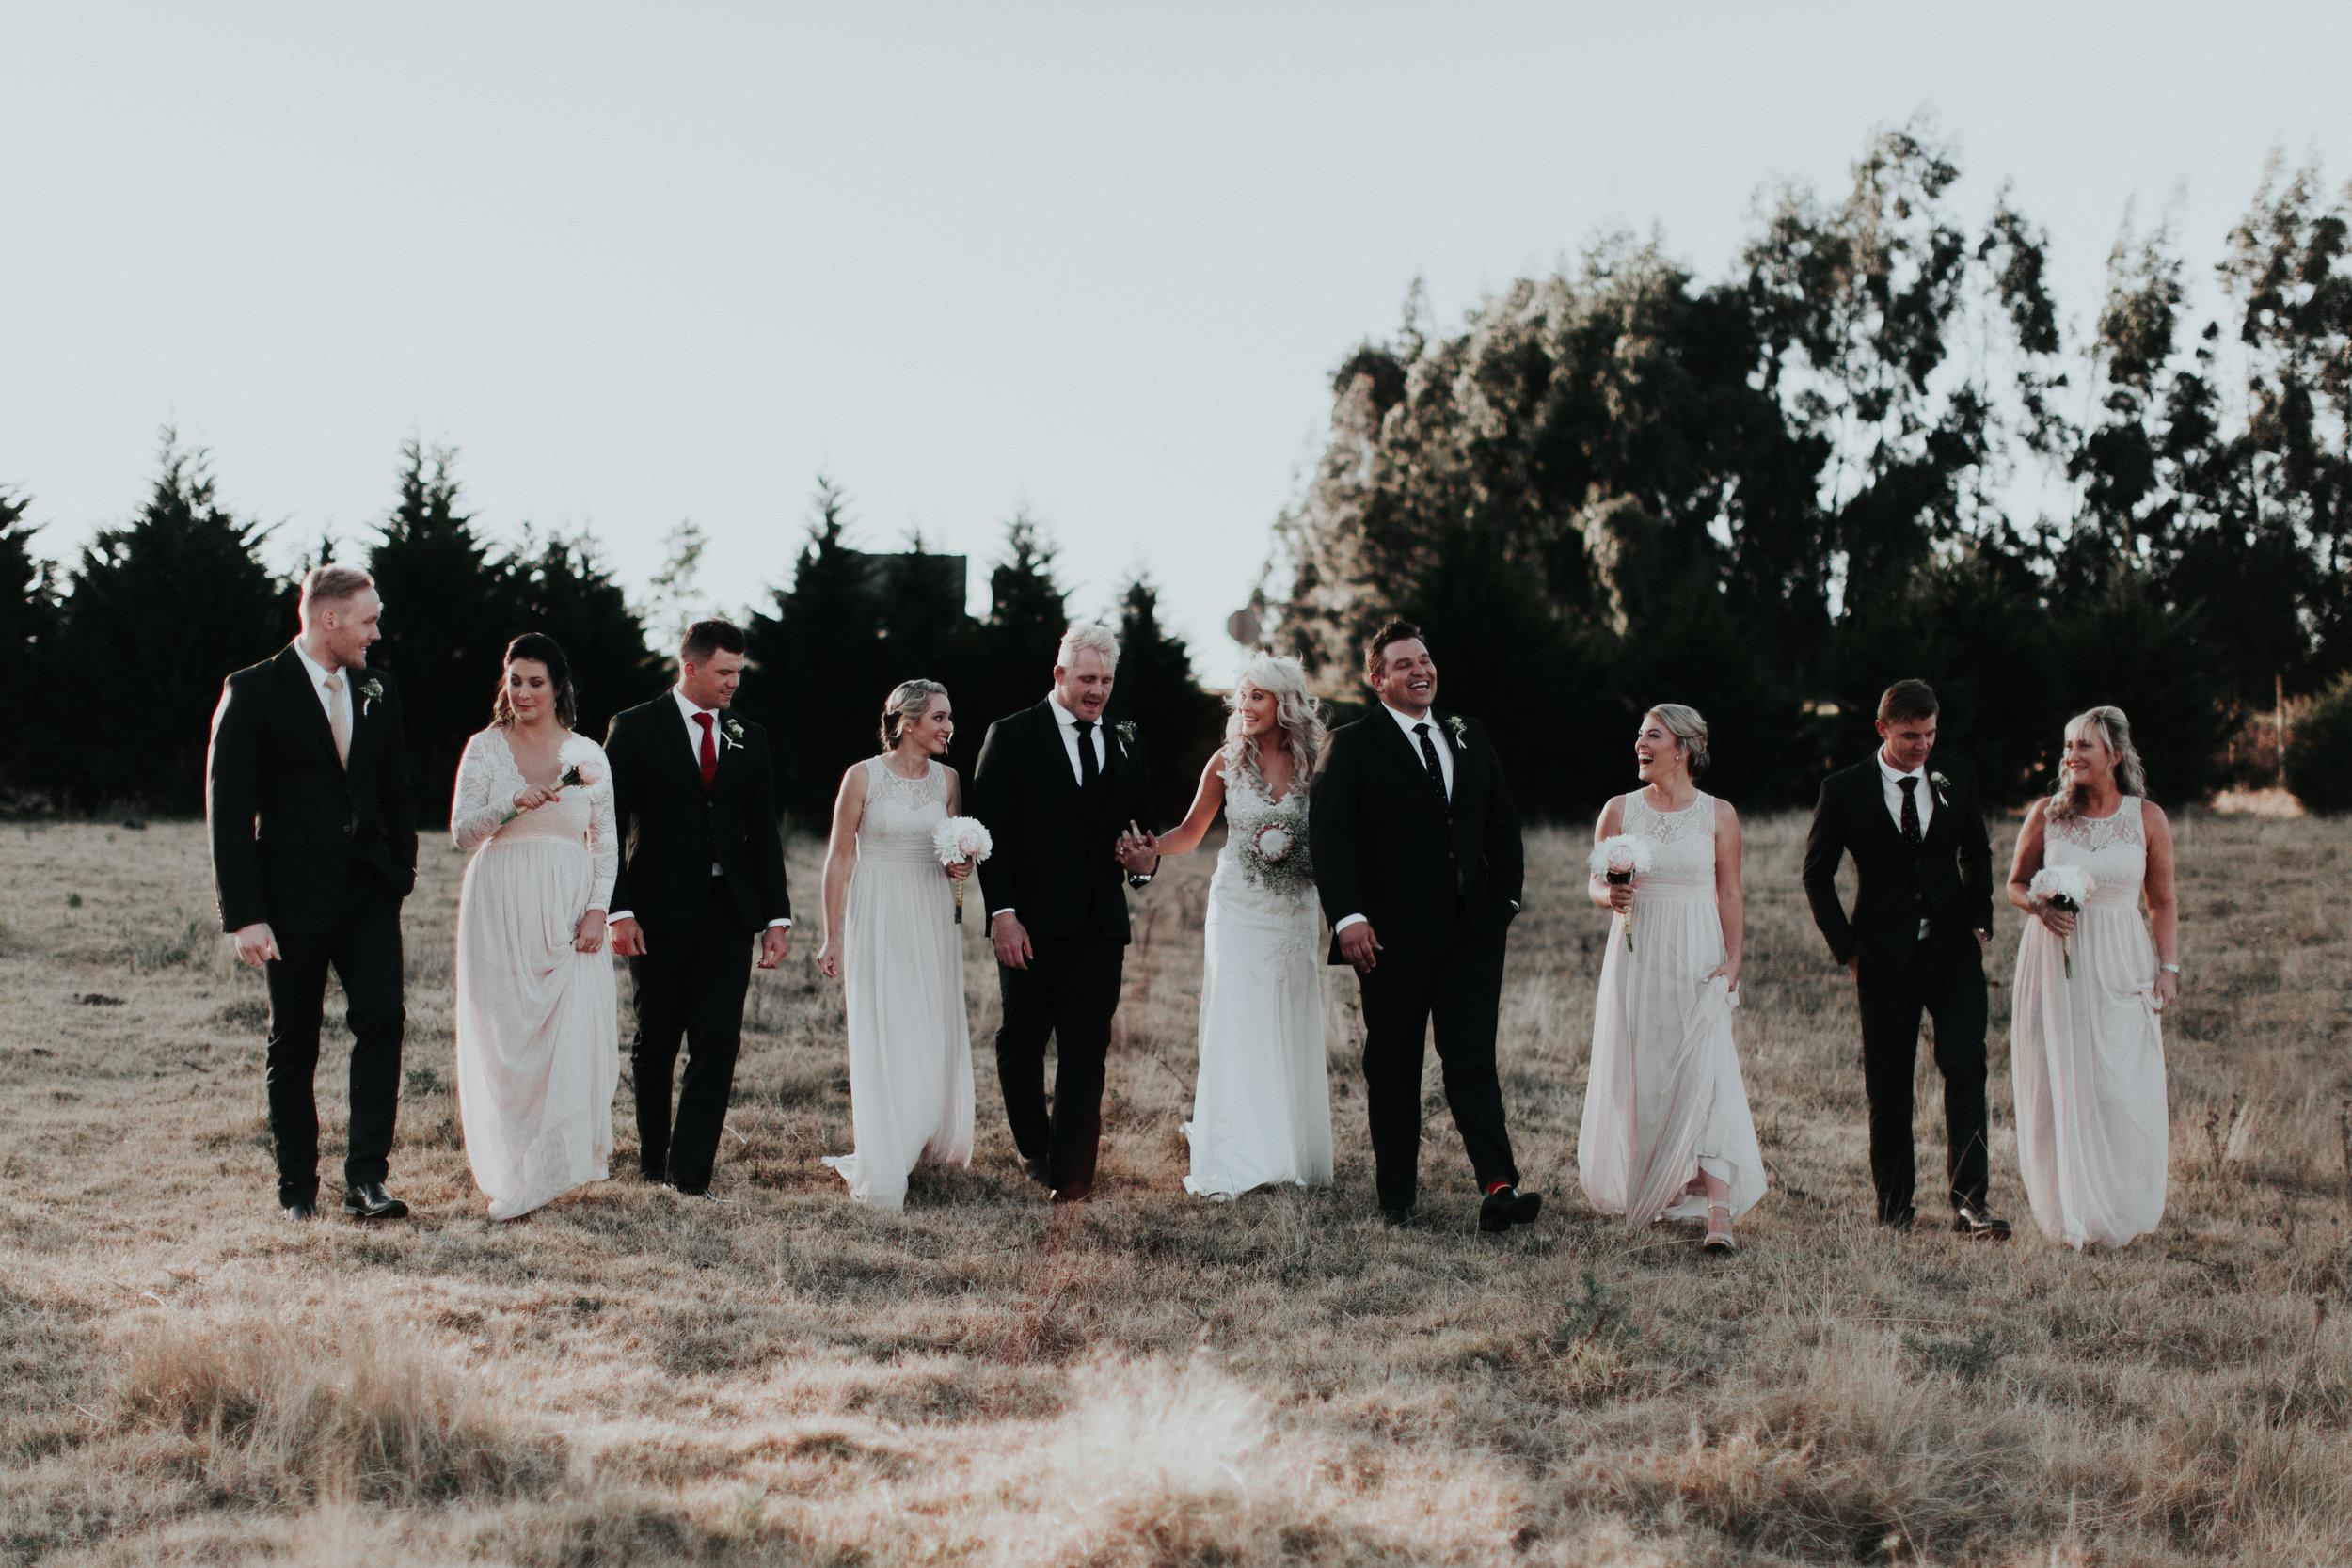 Kristi Smith Photography_Vincent&Jandre_ Wedding Photographer 13.jpg